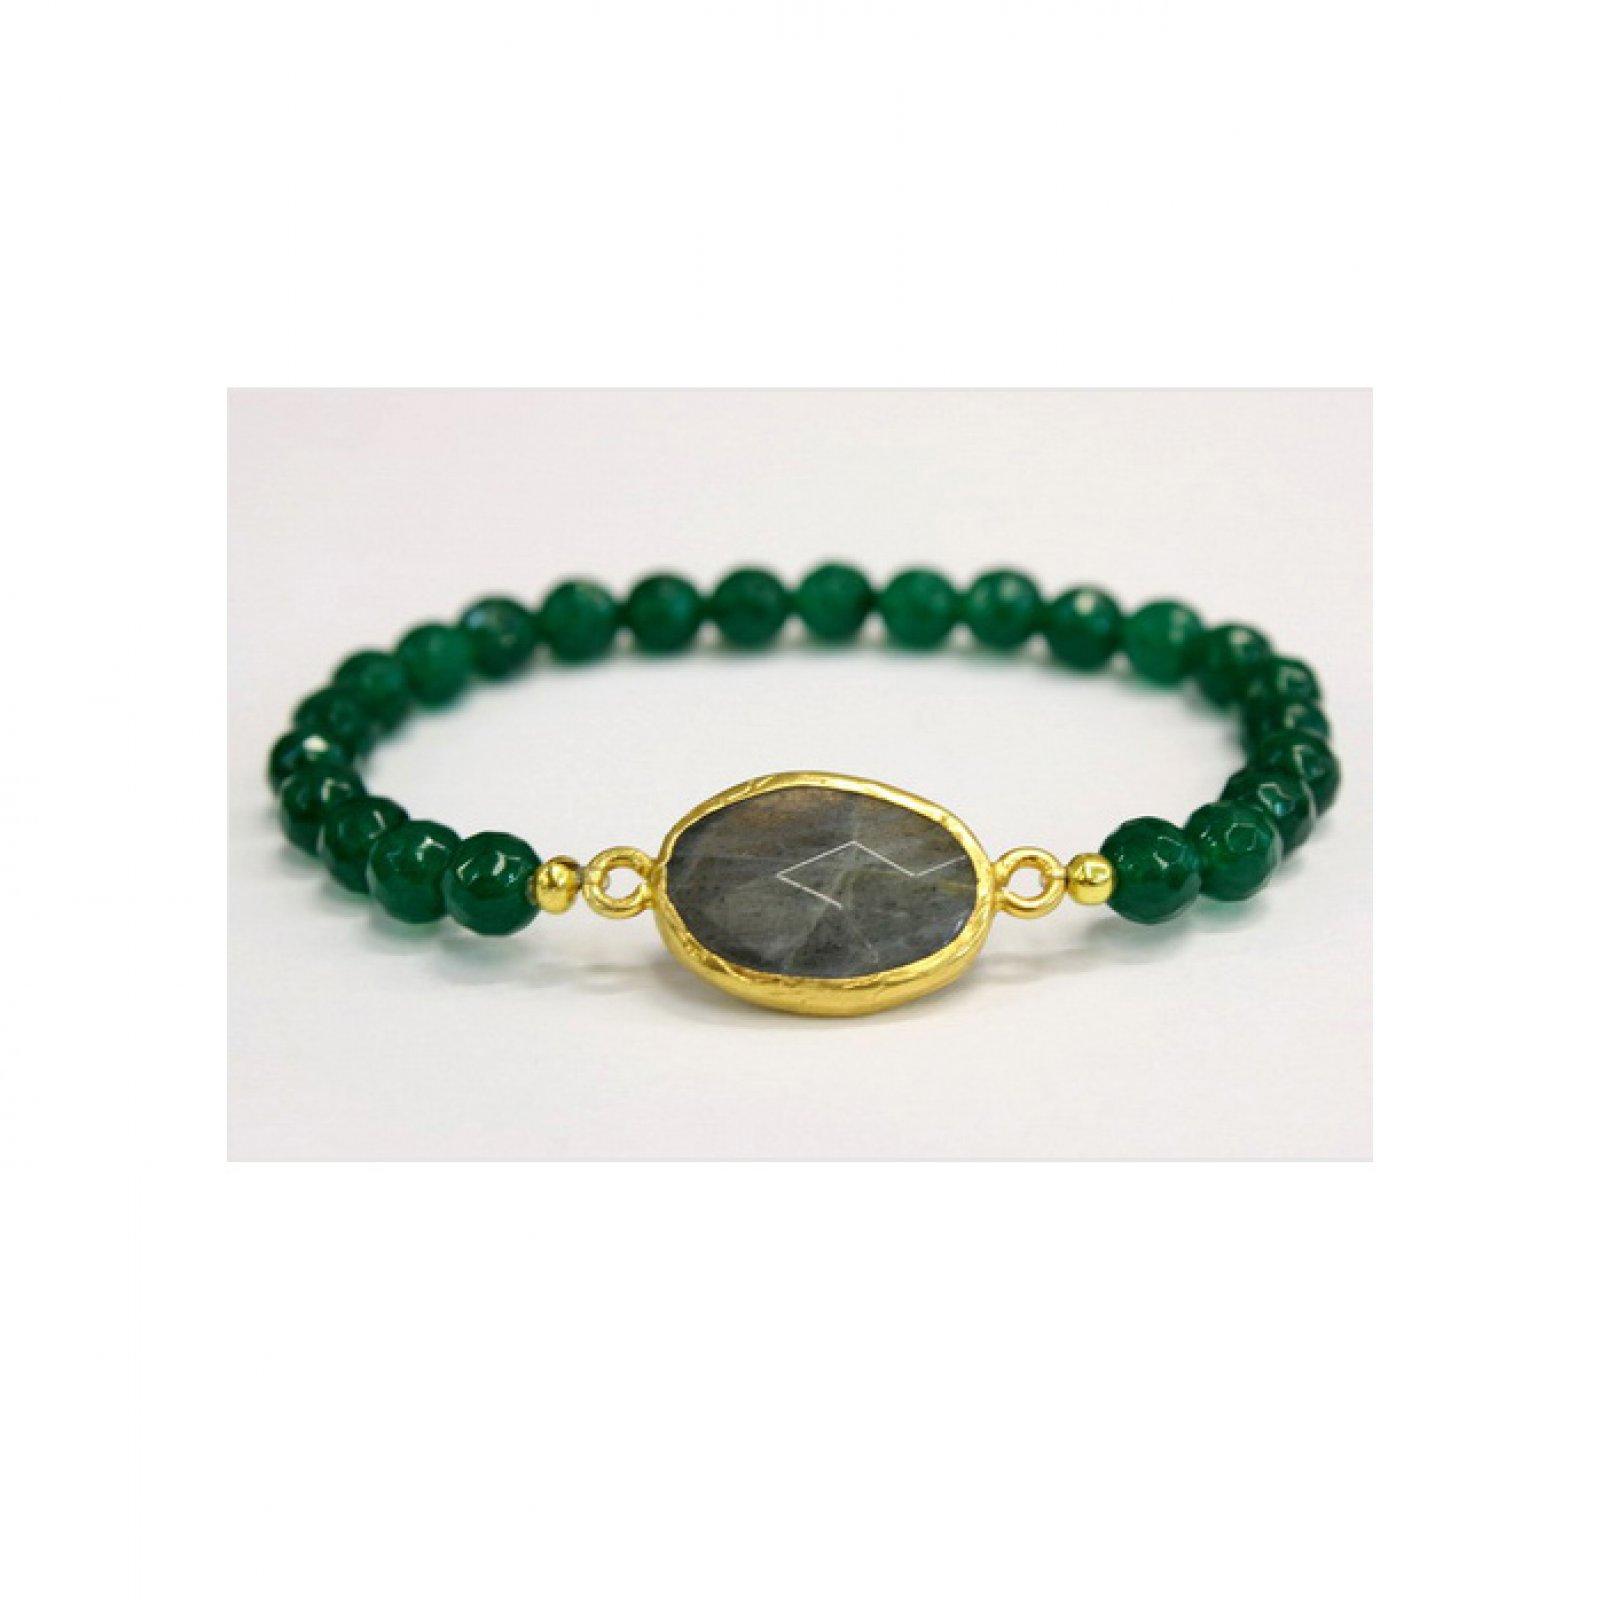 GB506 - GOLD PLATED HANDMADE LABRADORITE & GREEN JADE BEADS BRACELET